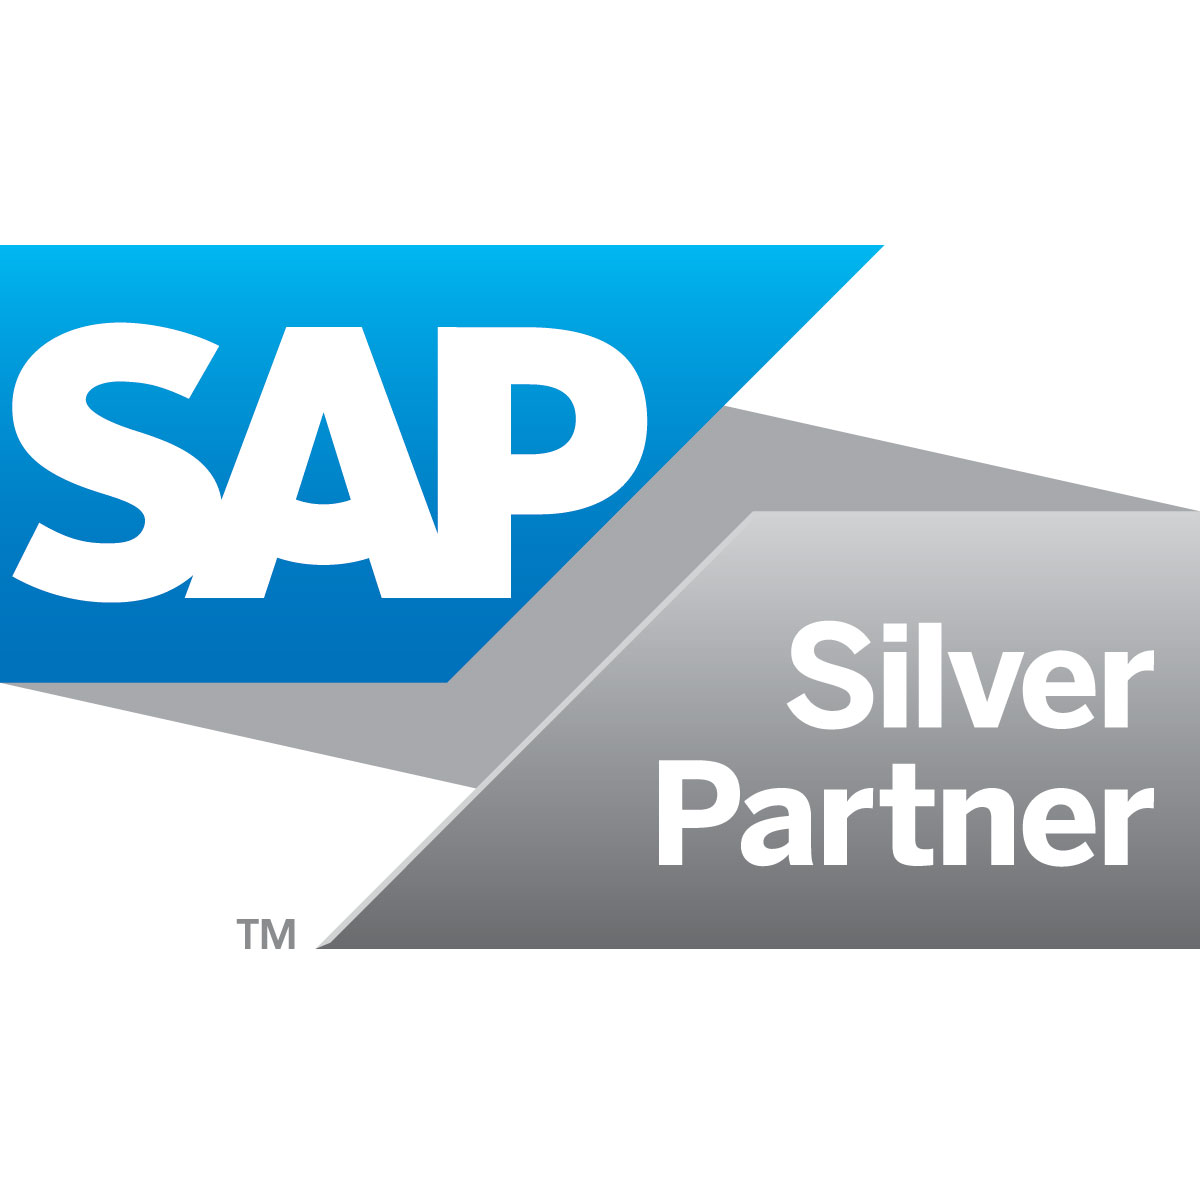 https://secureservercdn.net/198.71.233.199/sz0.269.myftpupload.com/wp-content/uploads/2020/06/SAP_Silver_Partner_C.jpg?time=1623617305